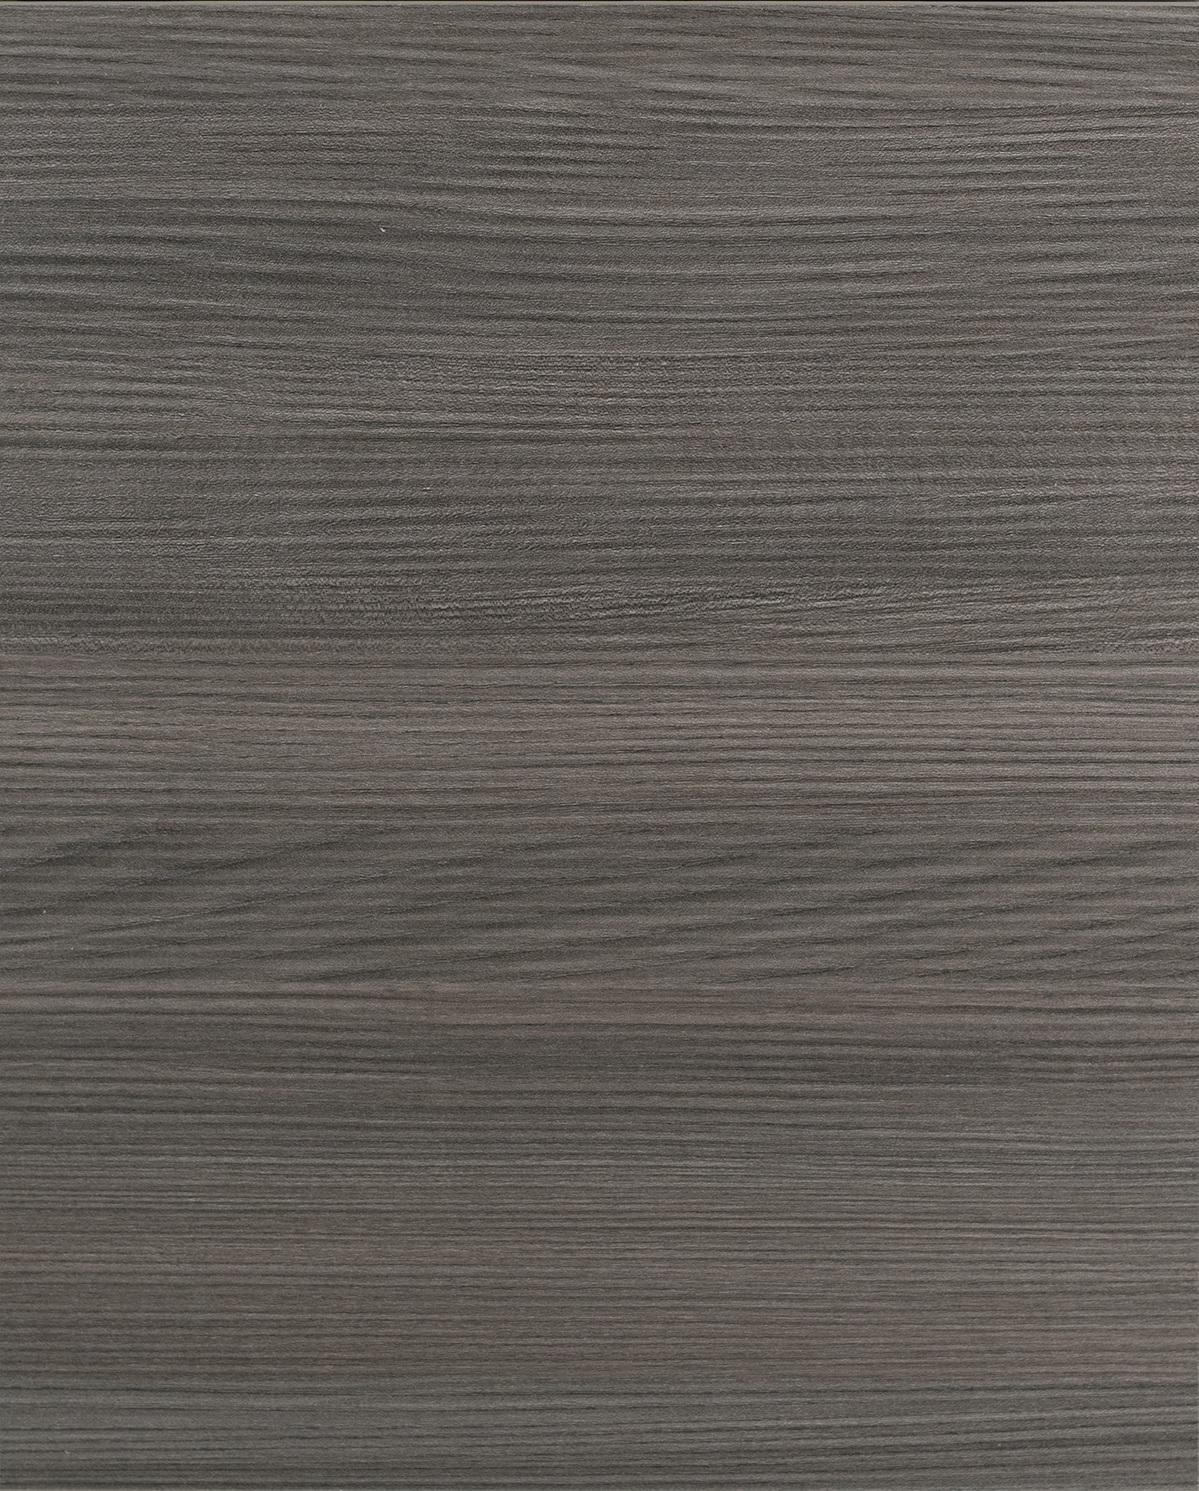 Horizon - Textured Laminate - Horizontal GrainShown in Dark Elm